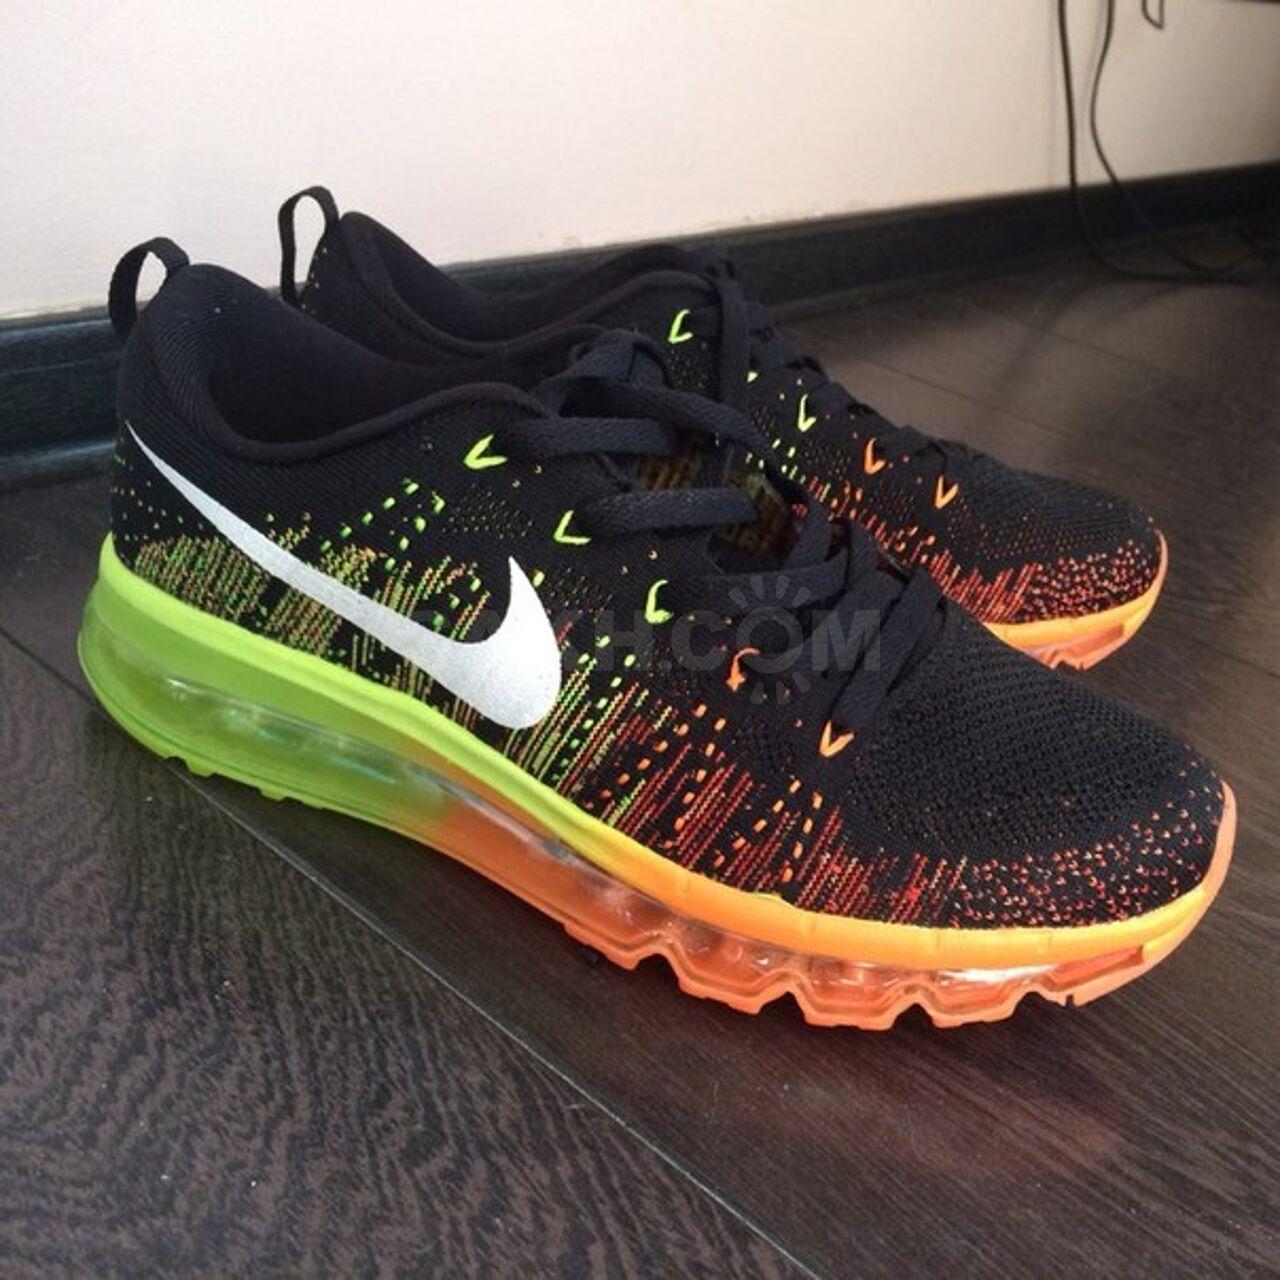 d6cb2cc97d0e Кроссовки Nike Flyknit Air Max - 4000 руб. Одежда, обувь и ...